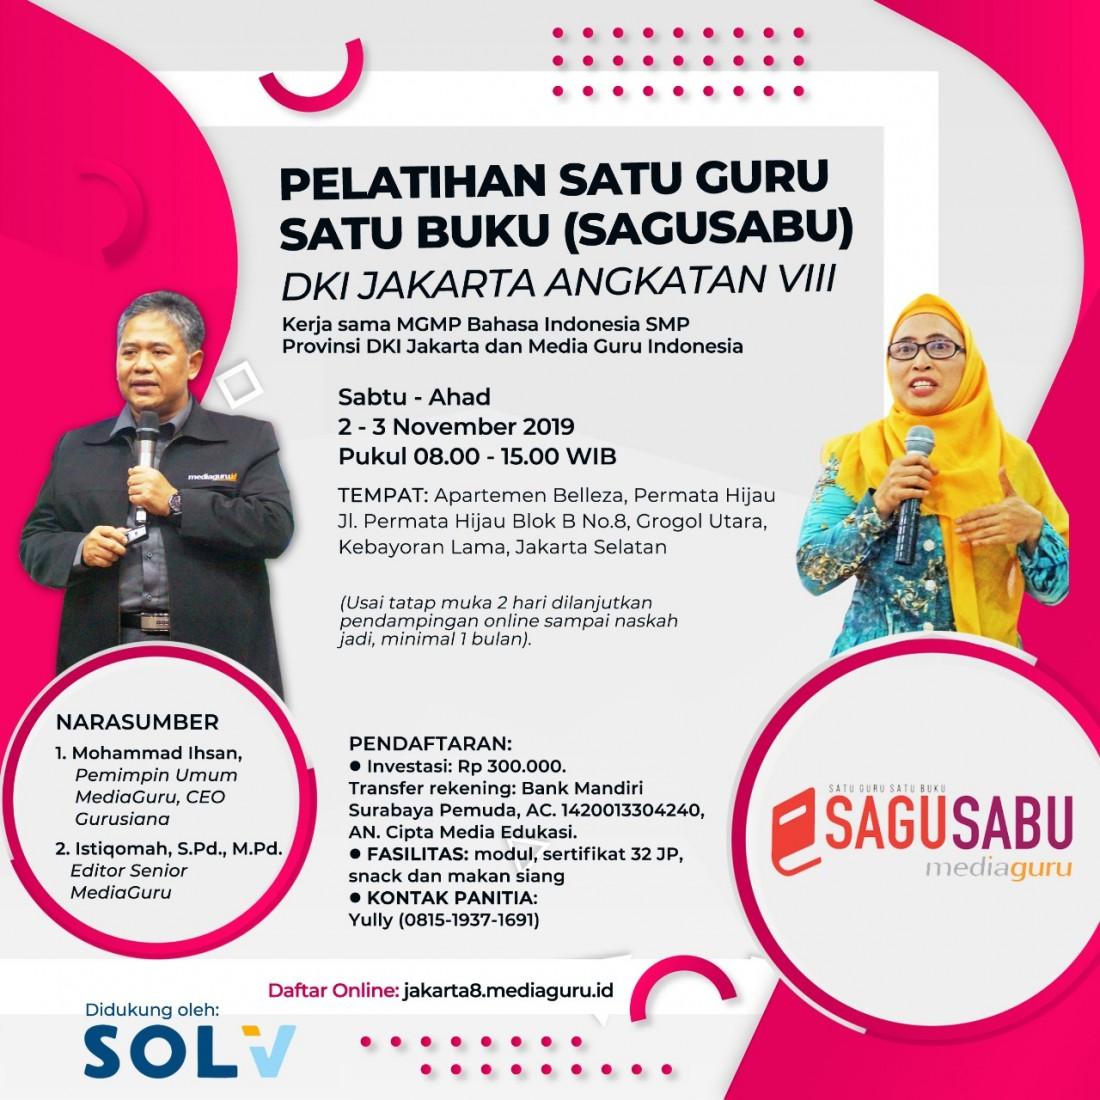 Pelatihan Menulis Sagusabu DKI Jakarta VIII (2 - 3 November 2019)